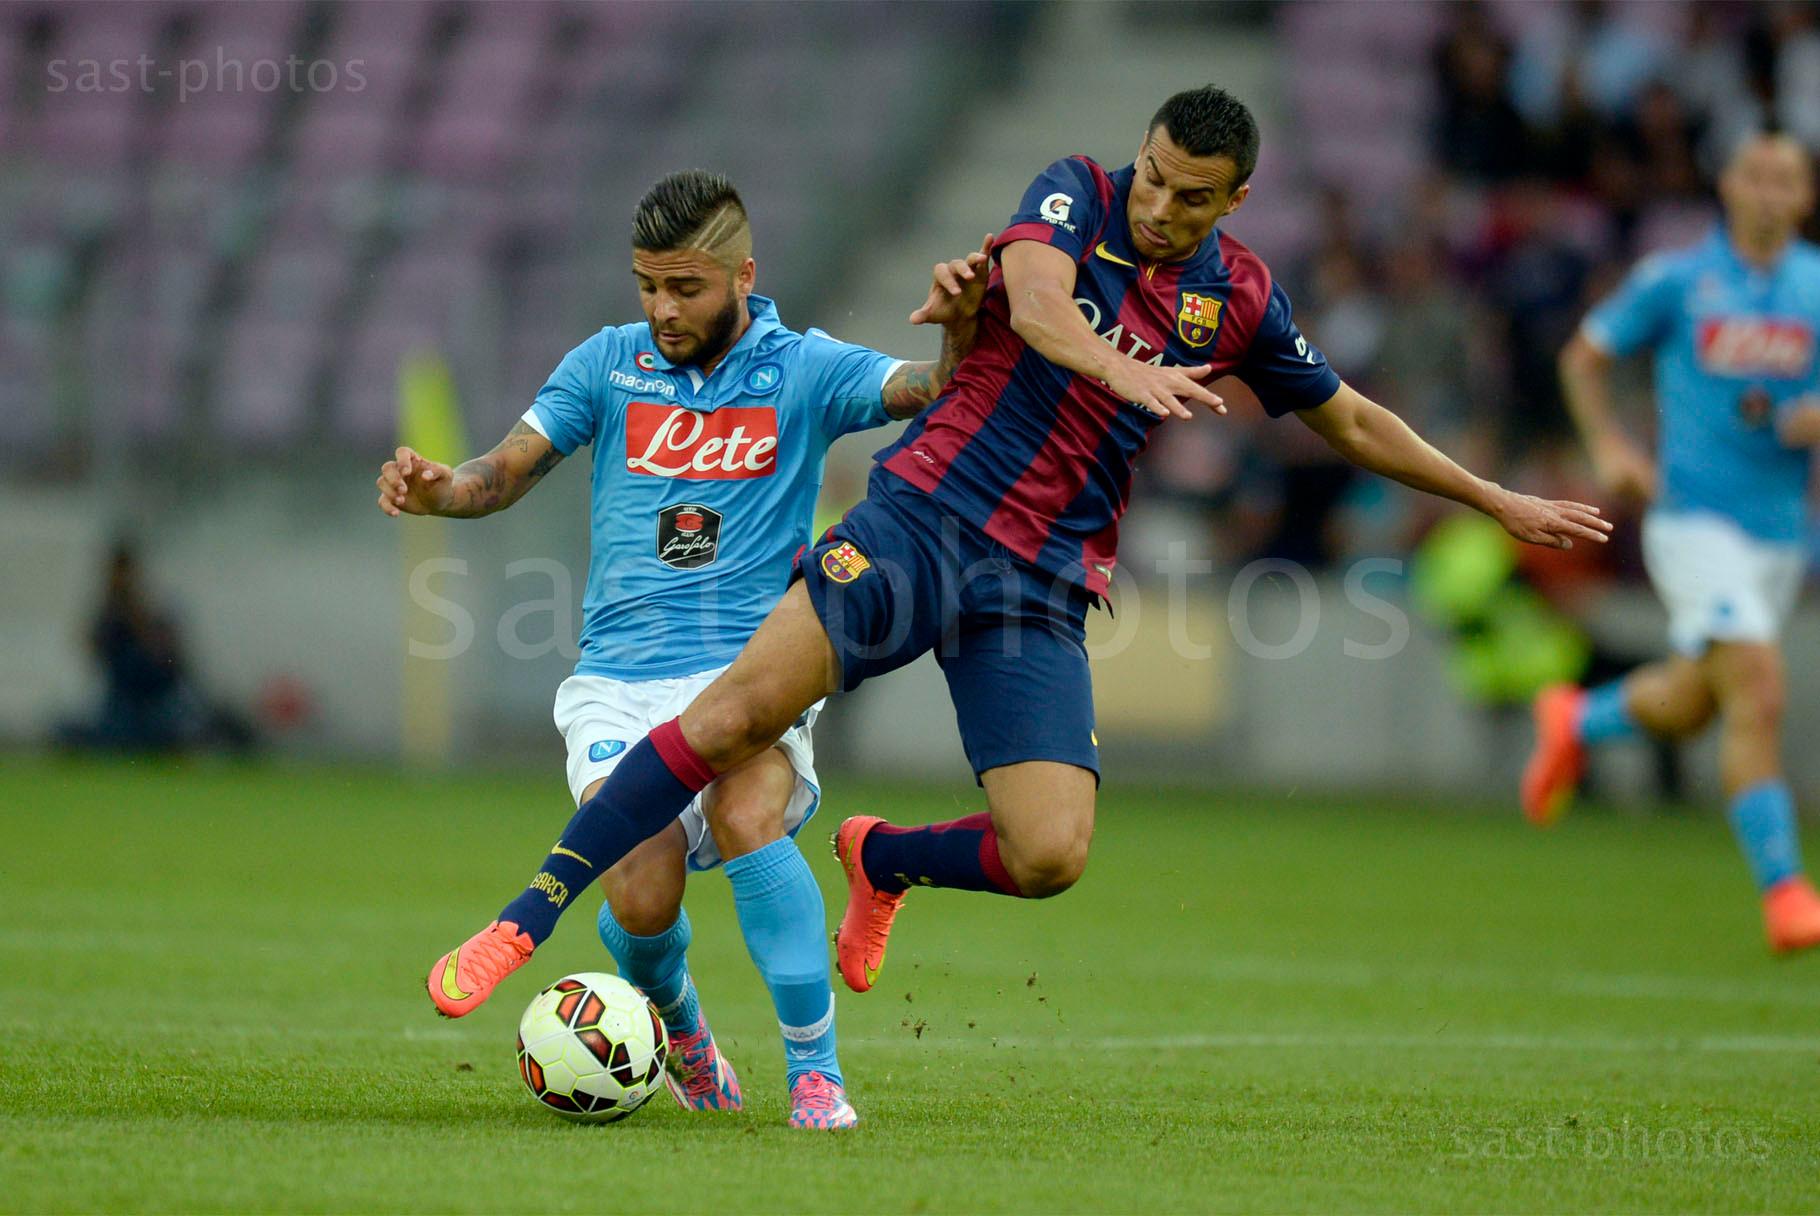 Lorenzo Insigne (L. Napoli) gegen Pedro Rodriguez Ledesma (Barcelona)